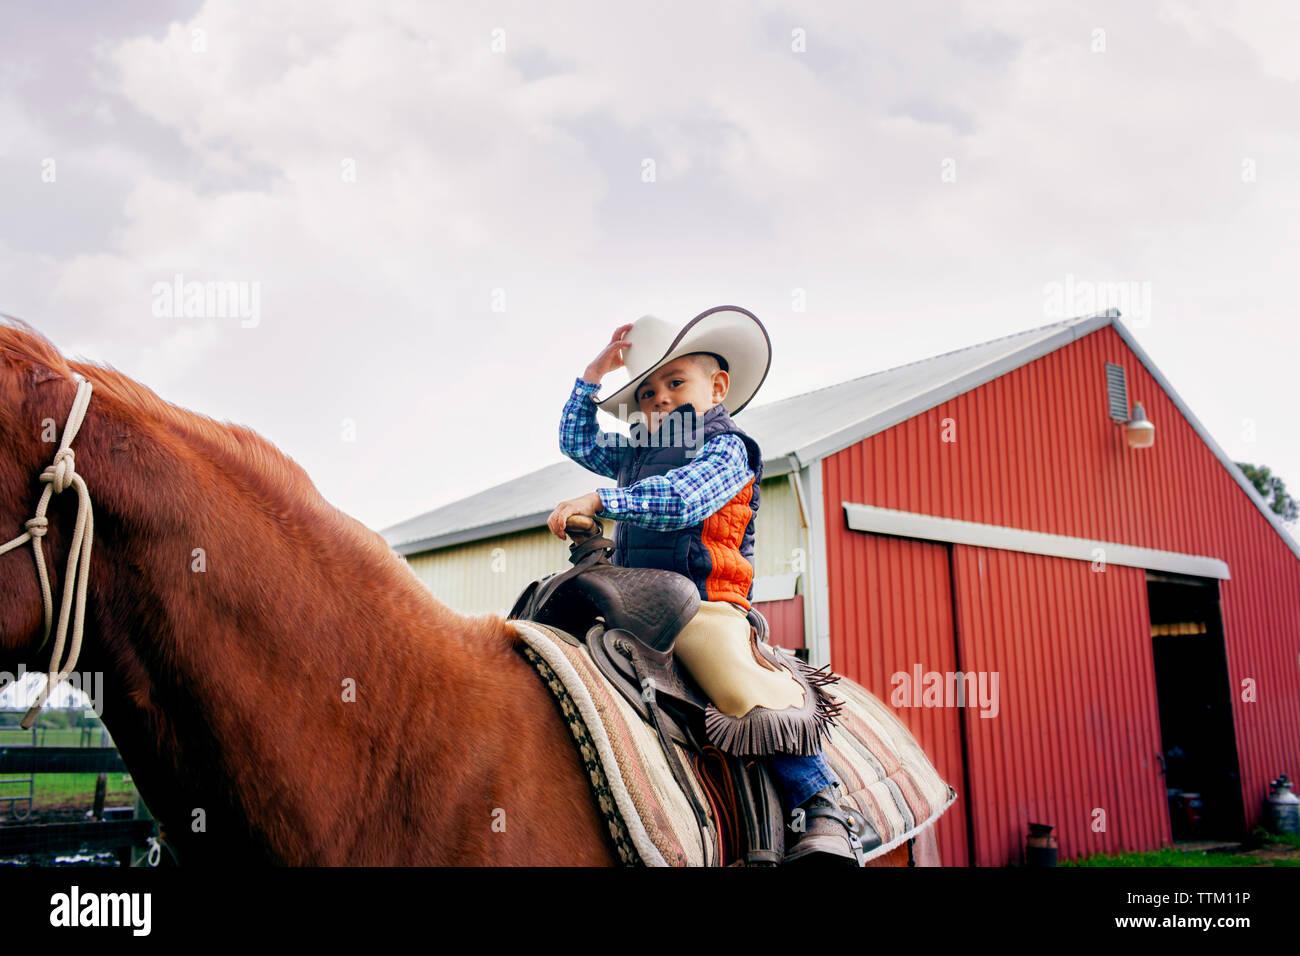 Cute cowboy riding horse against clear sky Stock Photo